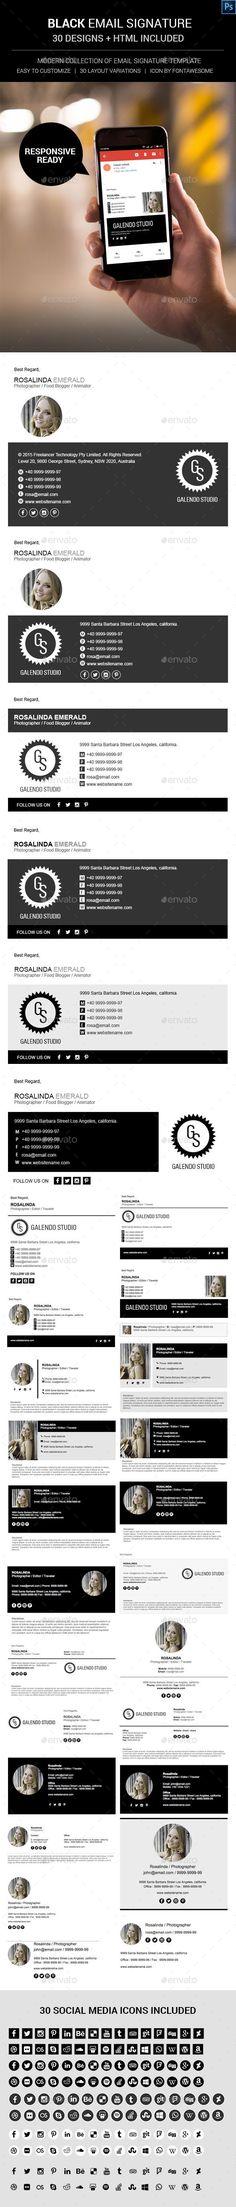 10 E-Signatures Email Signature Template PSD Download here http - email signature template